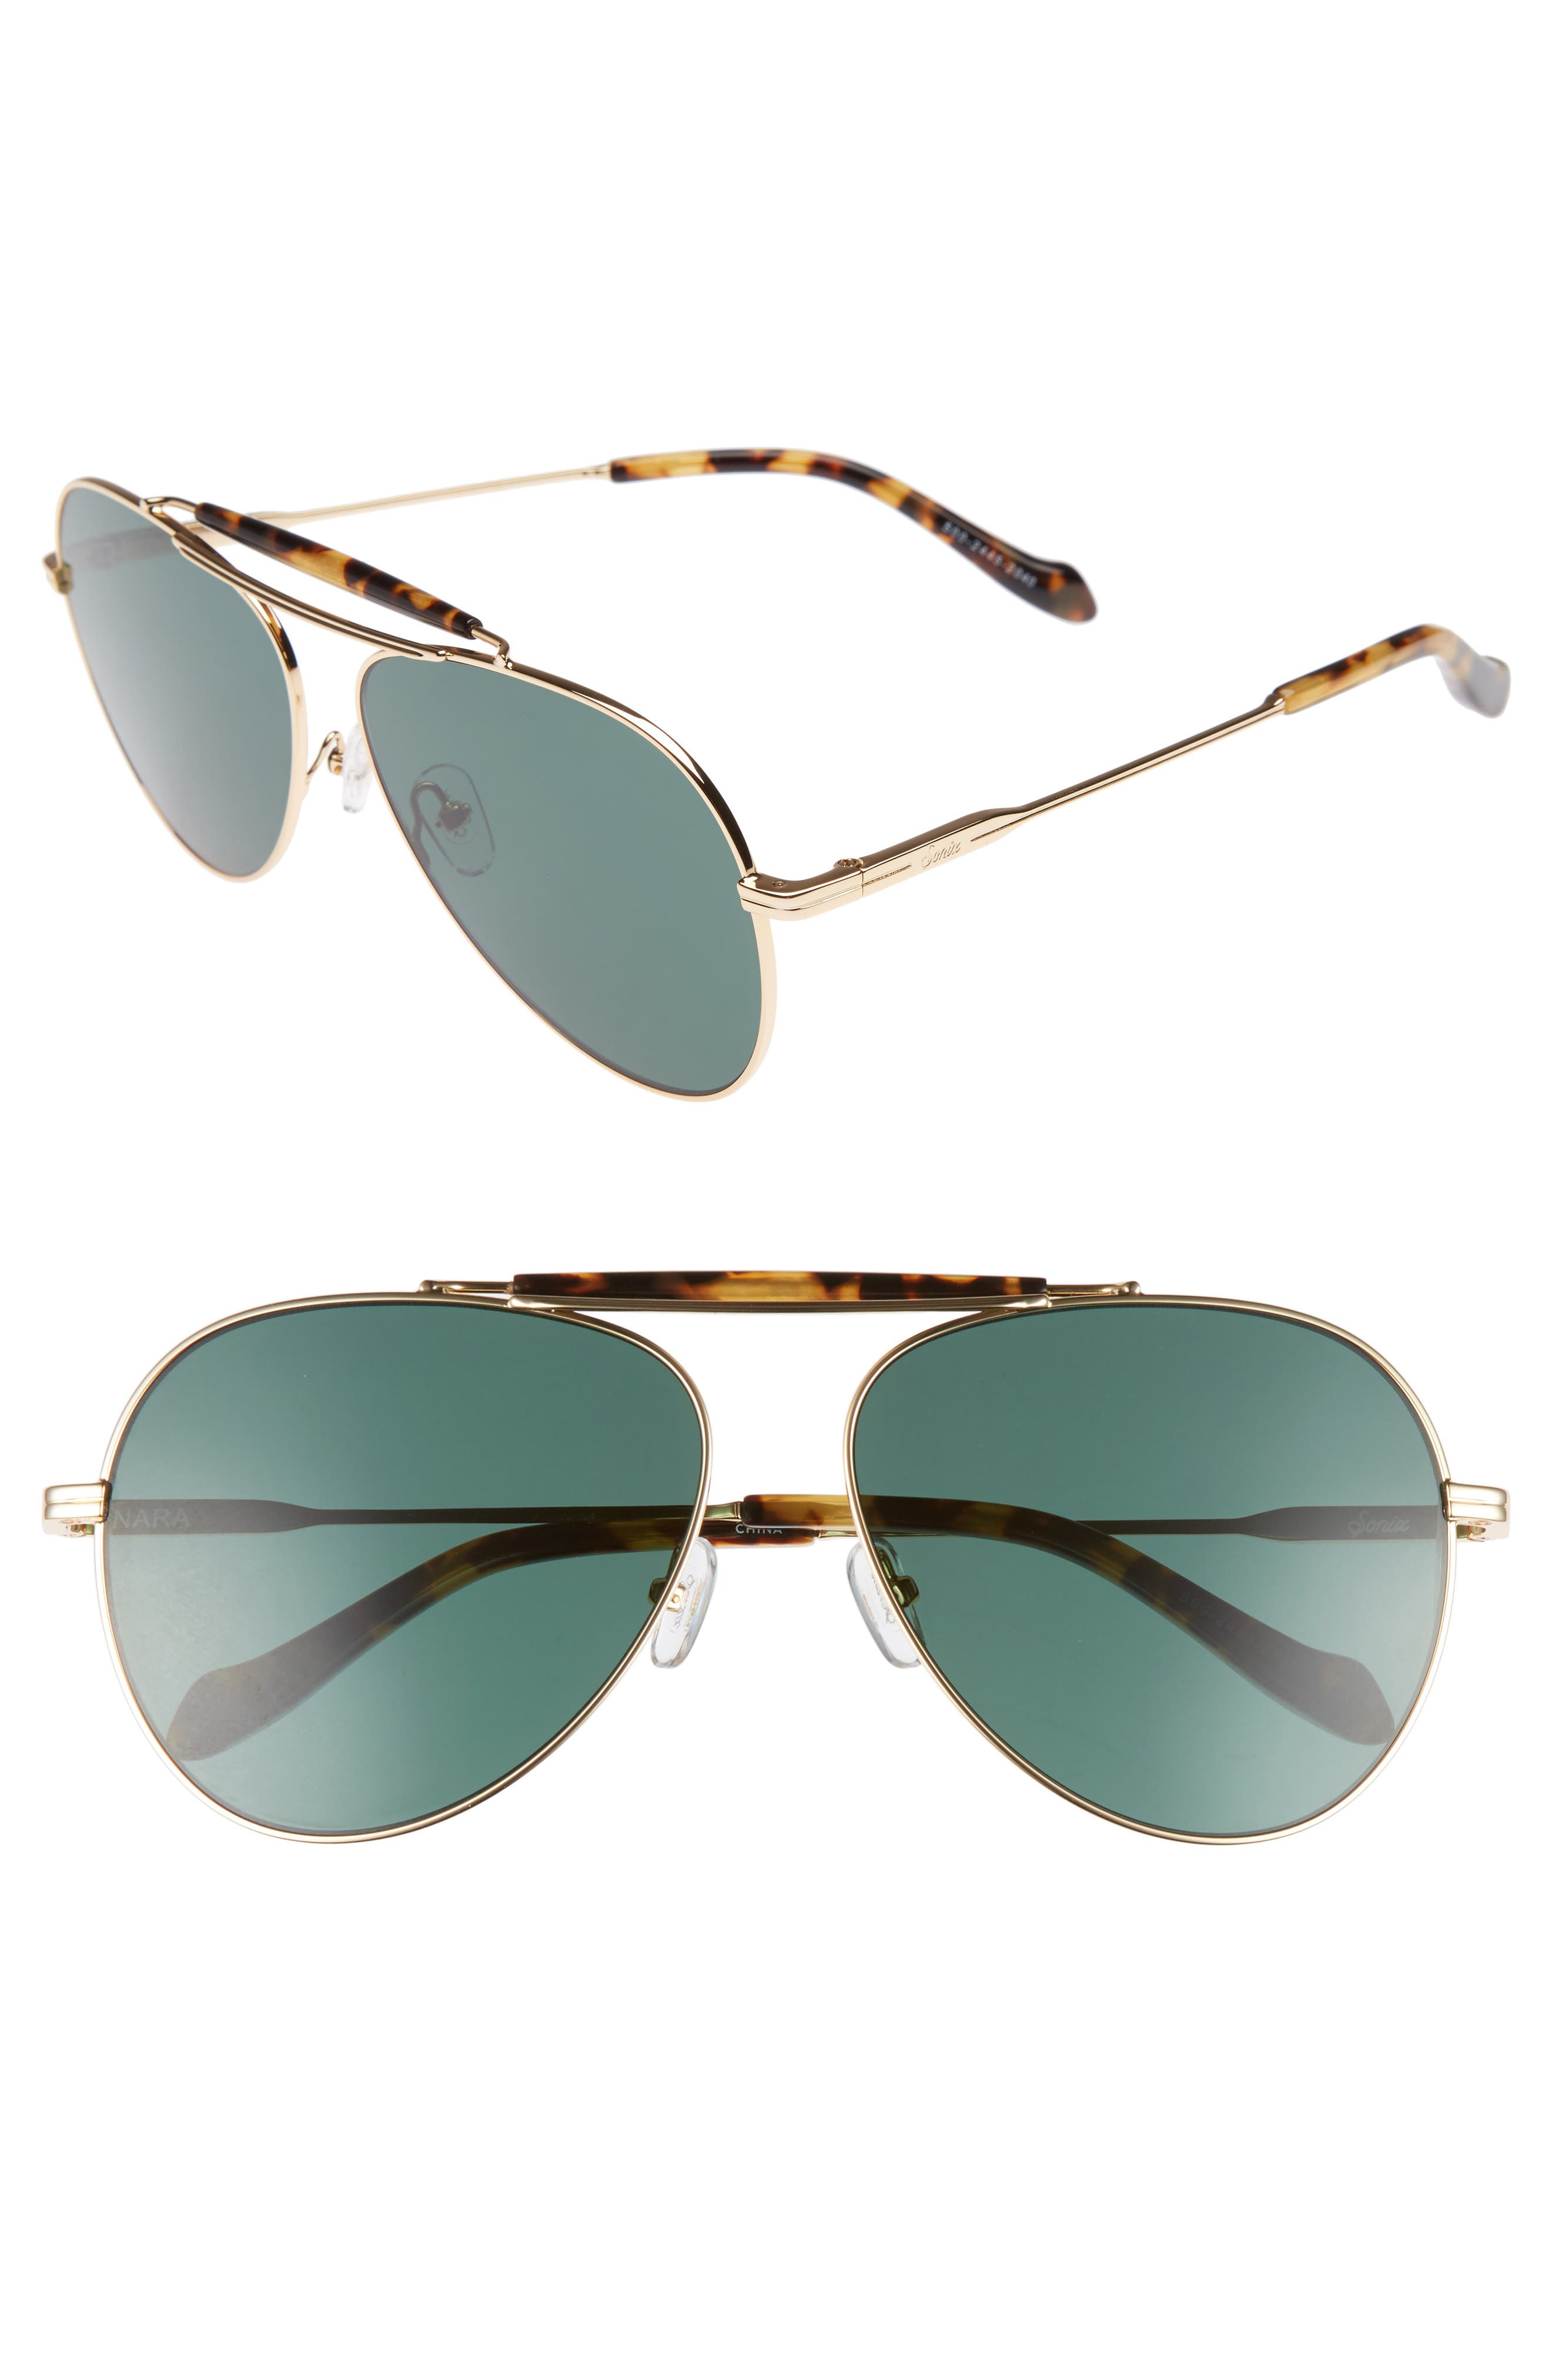 Nara 60mm Aviator Sunglasses,                         Main,                         color,